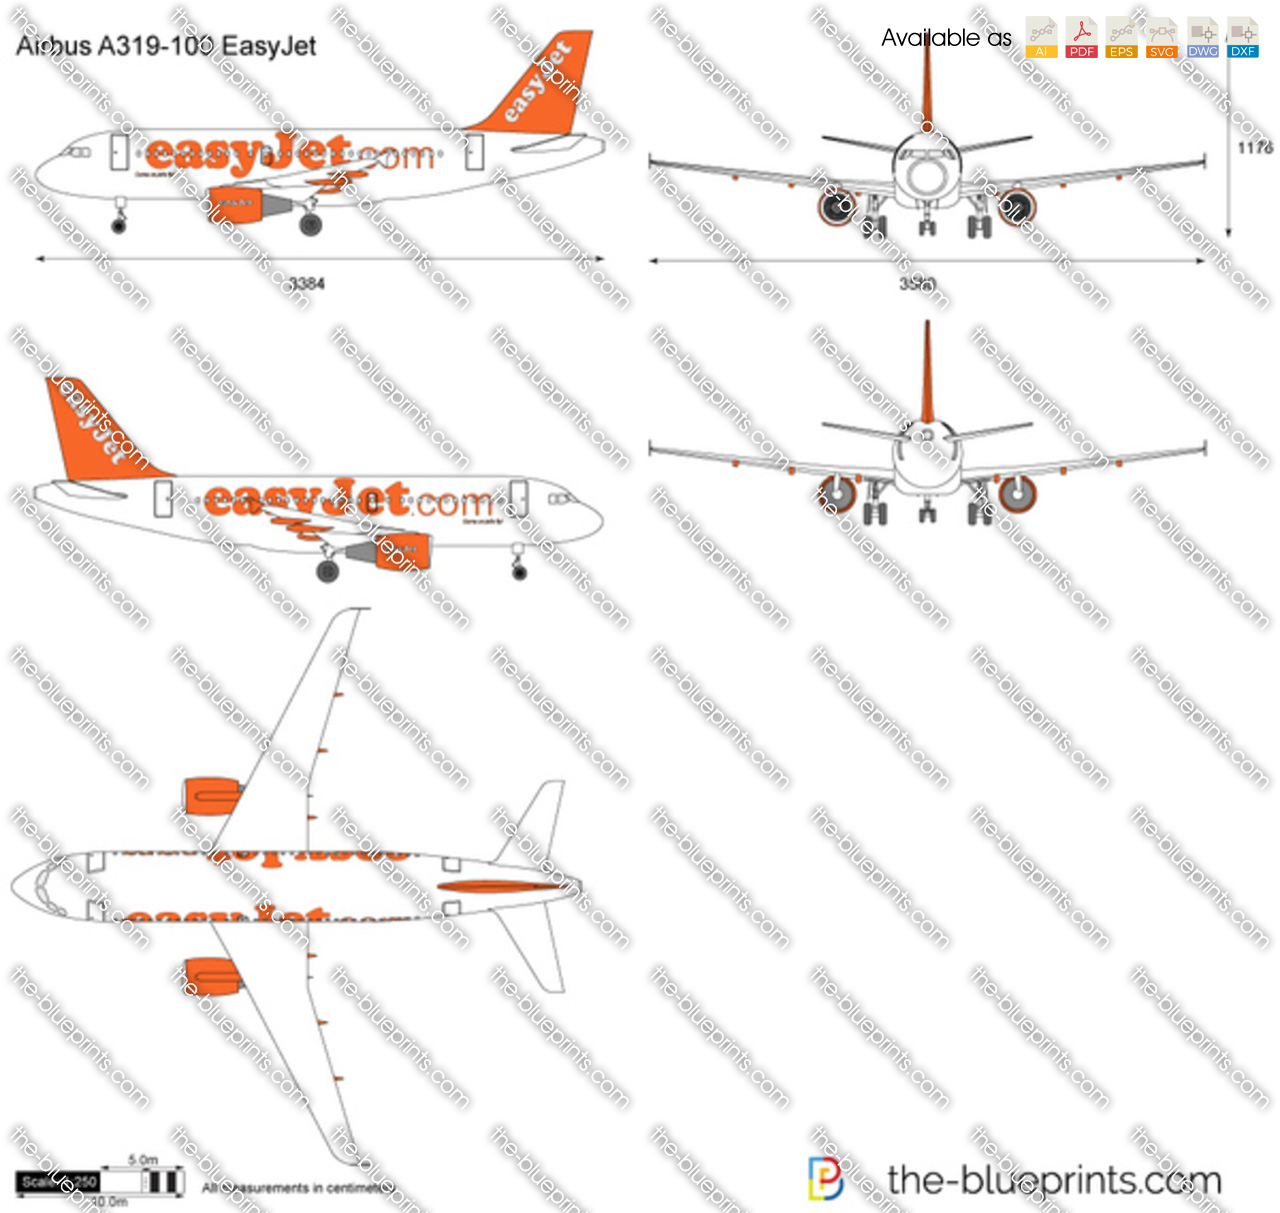 Airbus A319-100 EasyJet